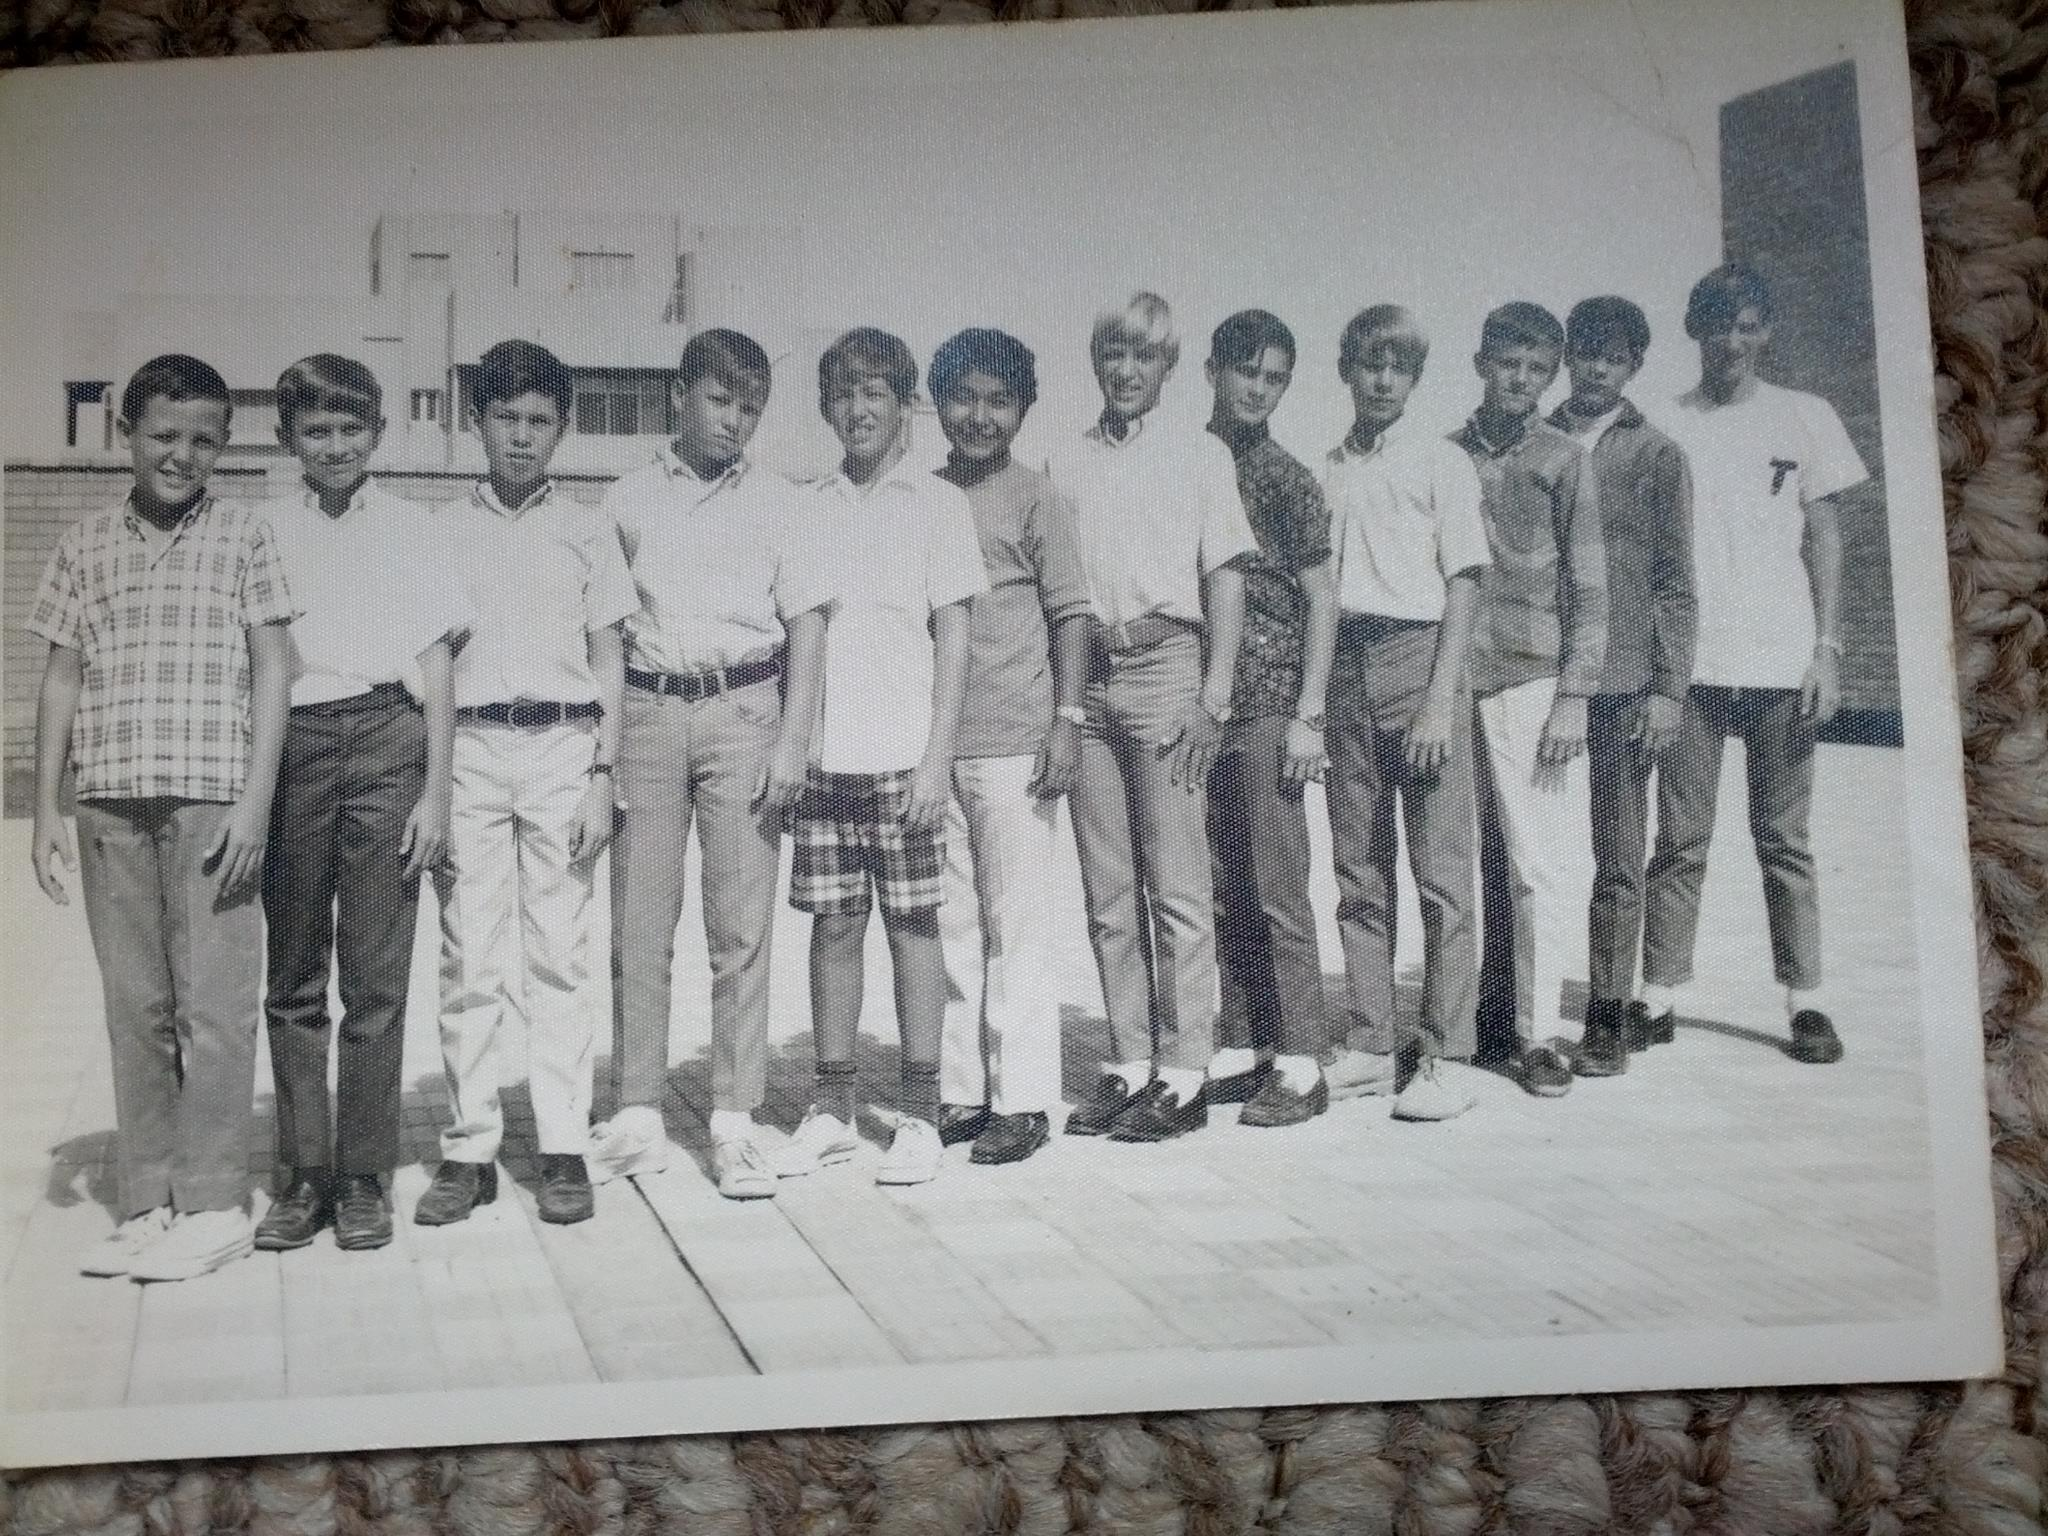 8th grade softball team with Greg in Jeddah Saudi Arabia, was a great teammate.